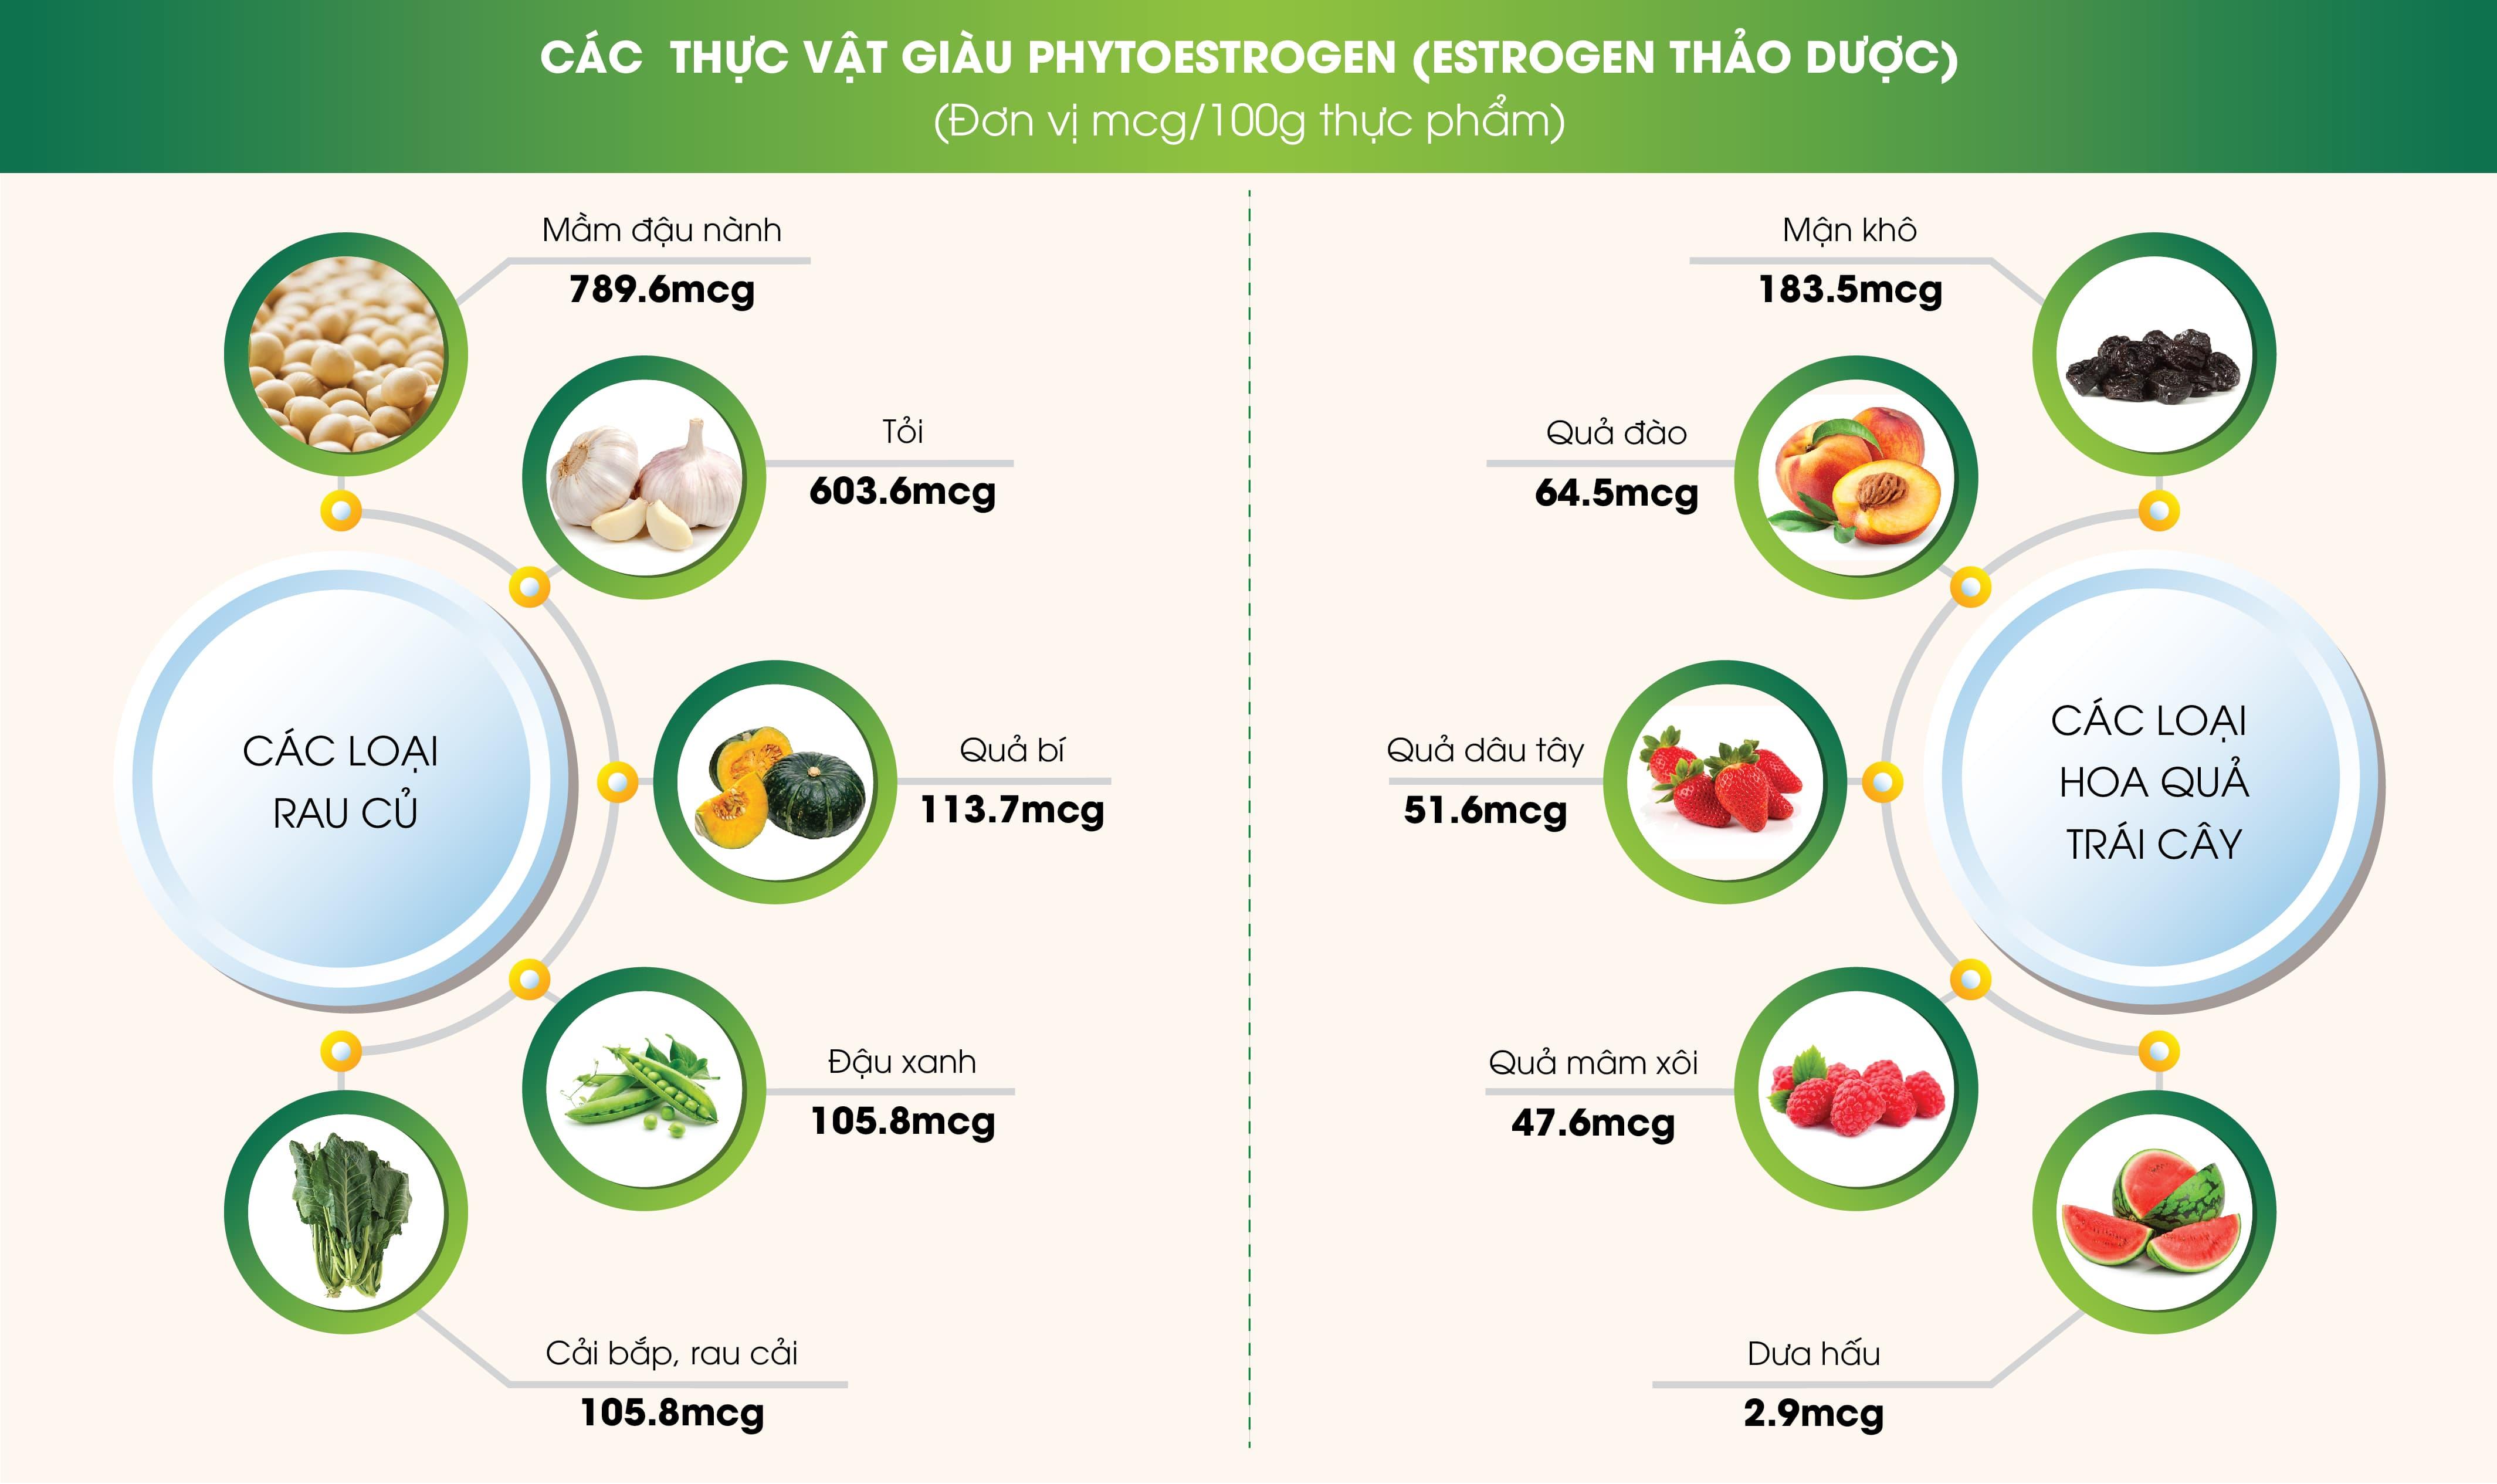 ham-luong-phytoestrogen-trong-thuc-pham